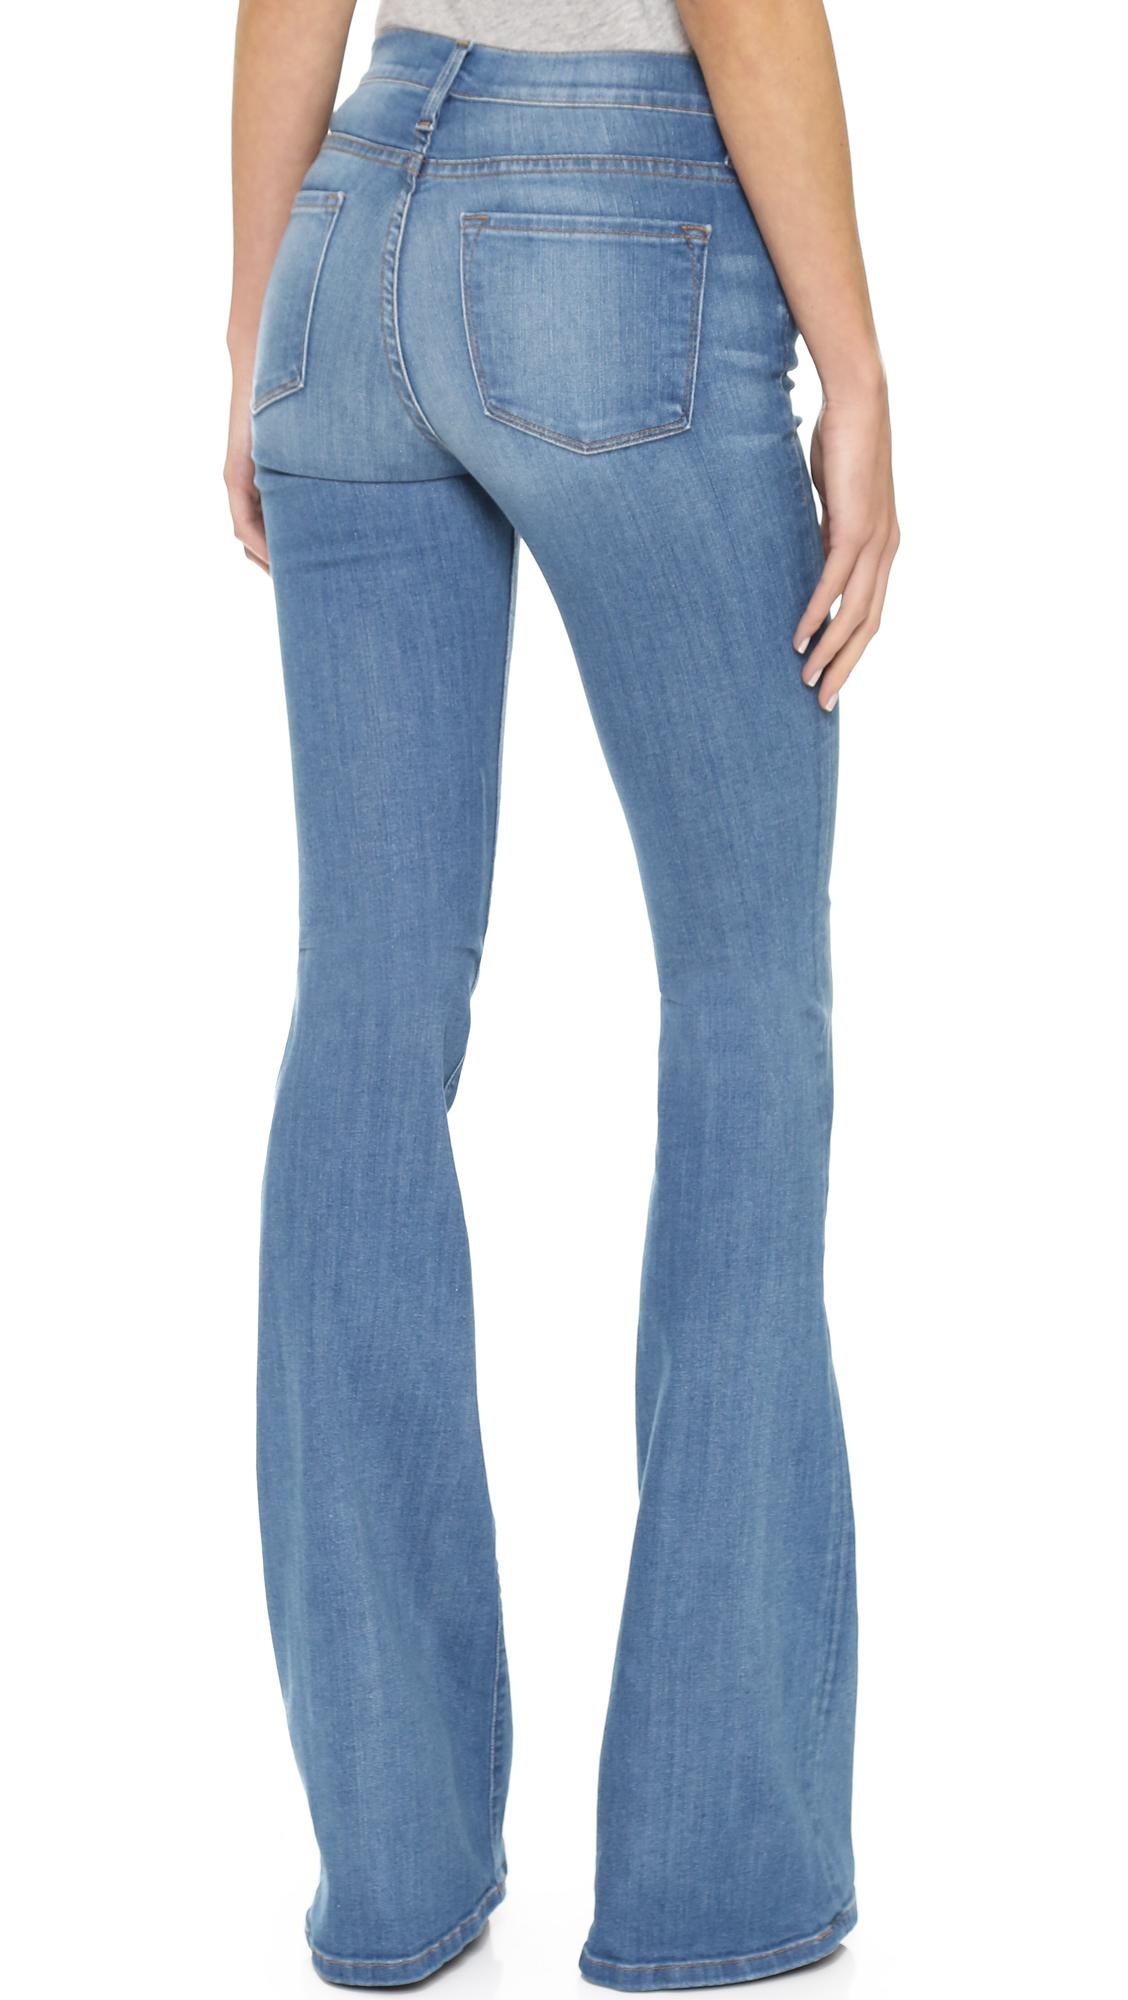 FRAME Forever Karlie Forever Tall Flare Jeans | 15% off first app ...